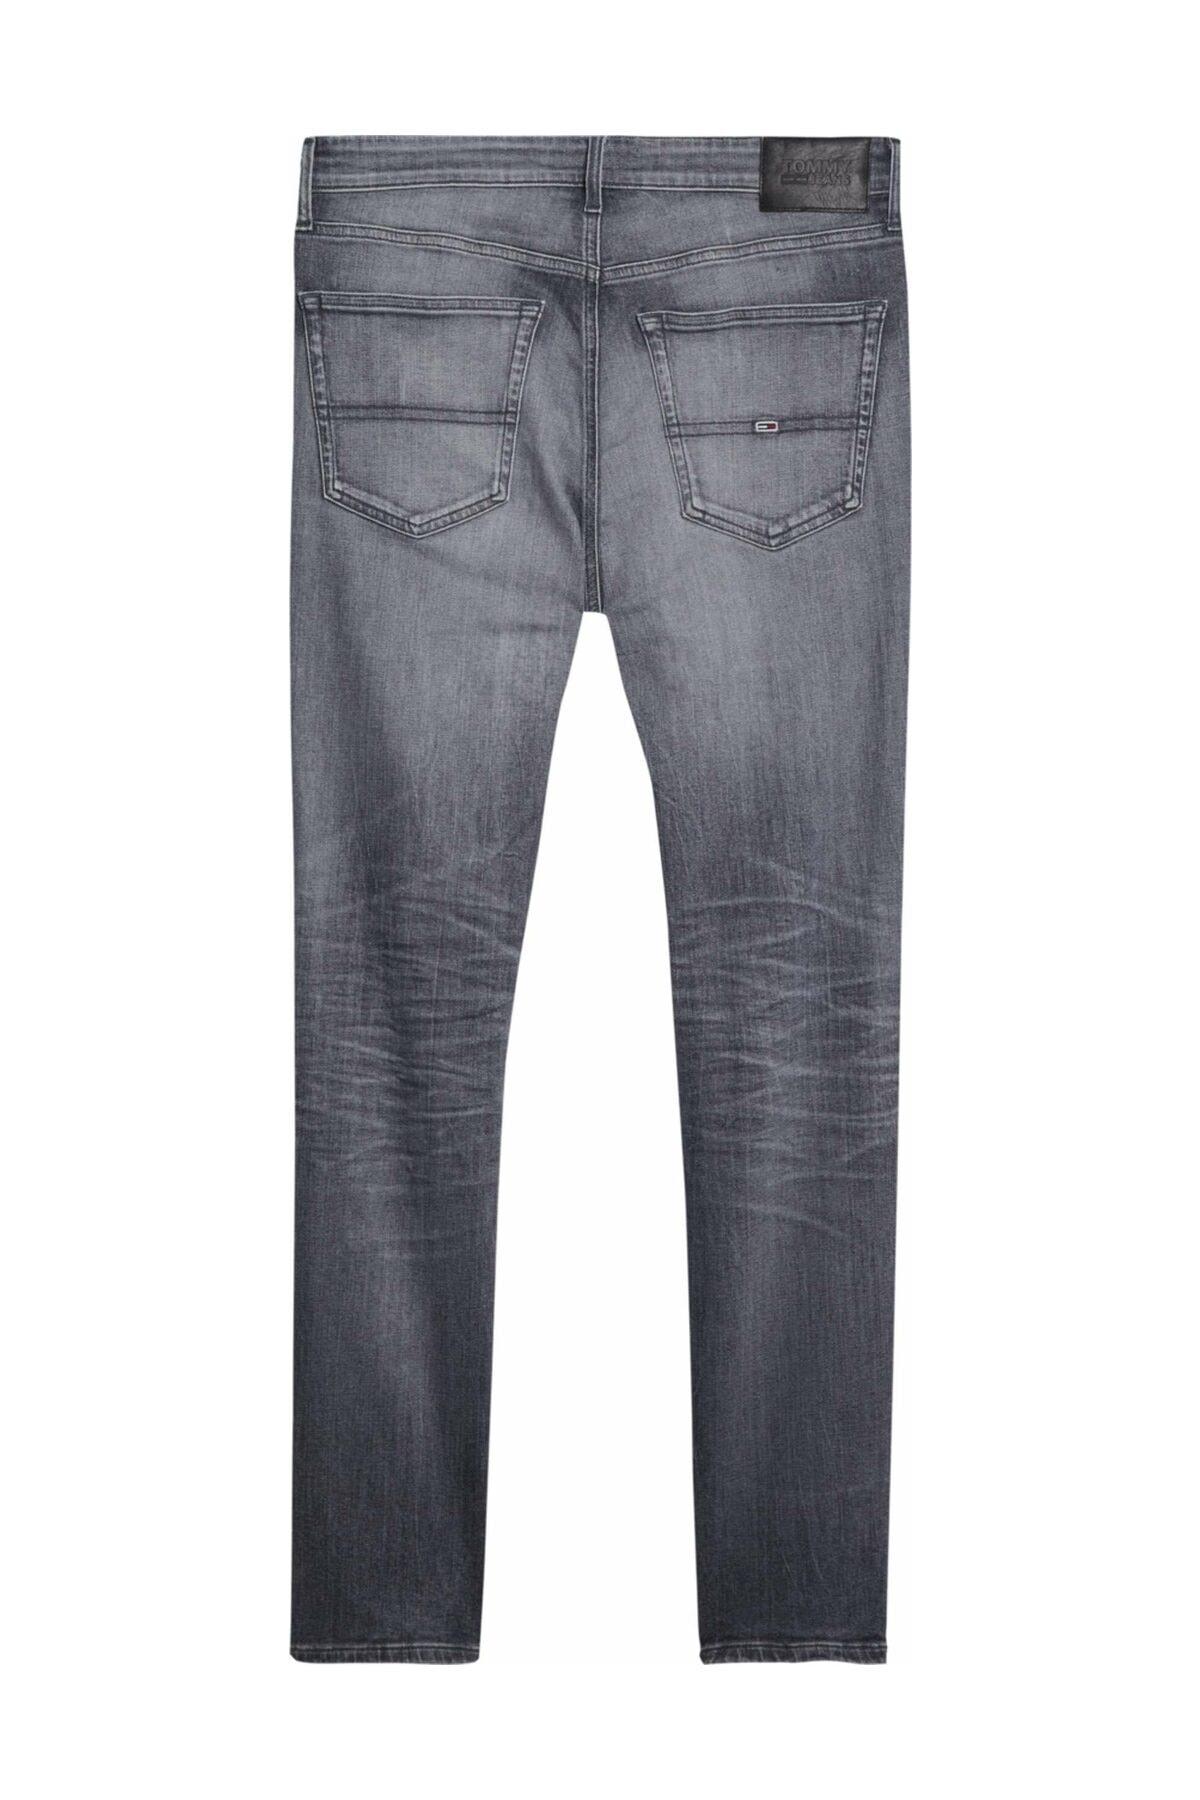 Tommy Hilfiger Erkek Denim Jeans Scanton Slım Mngrst DM0DM09282 2